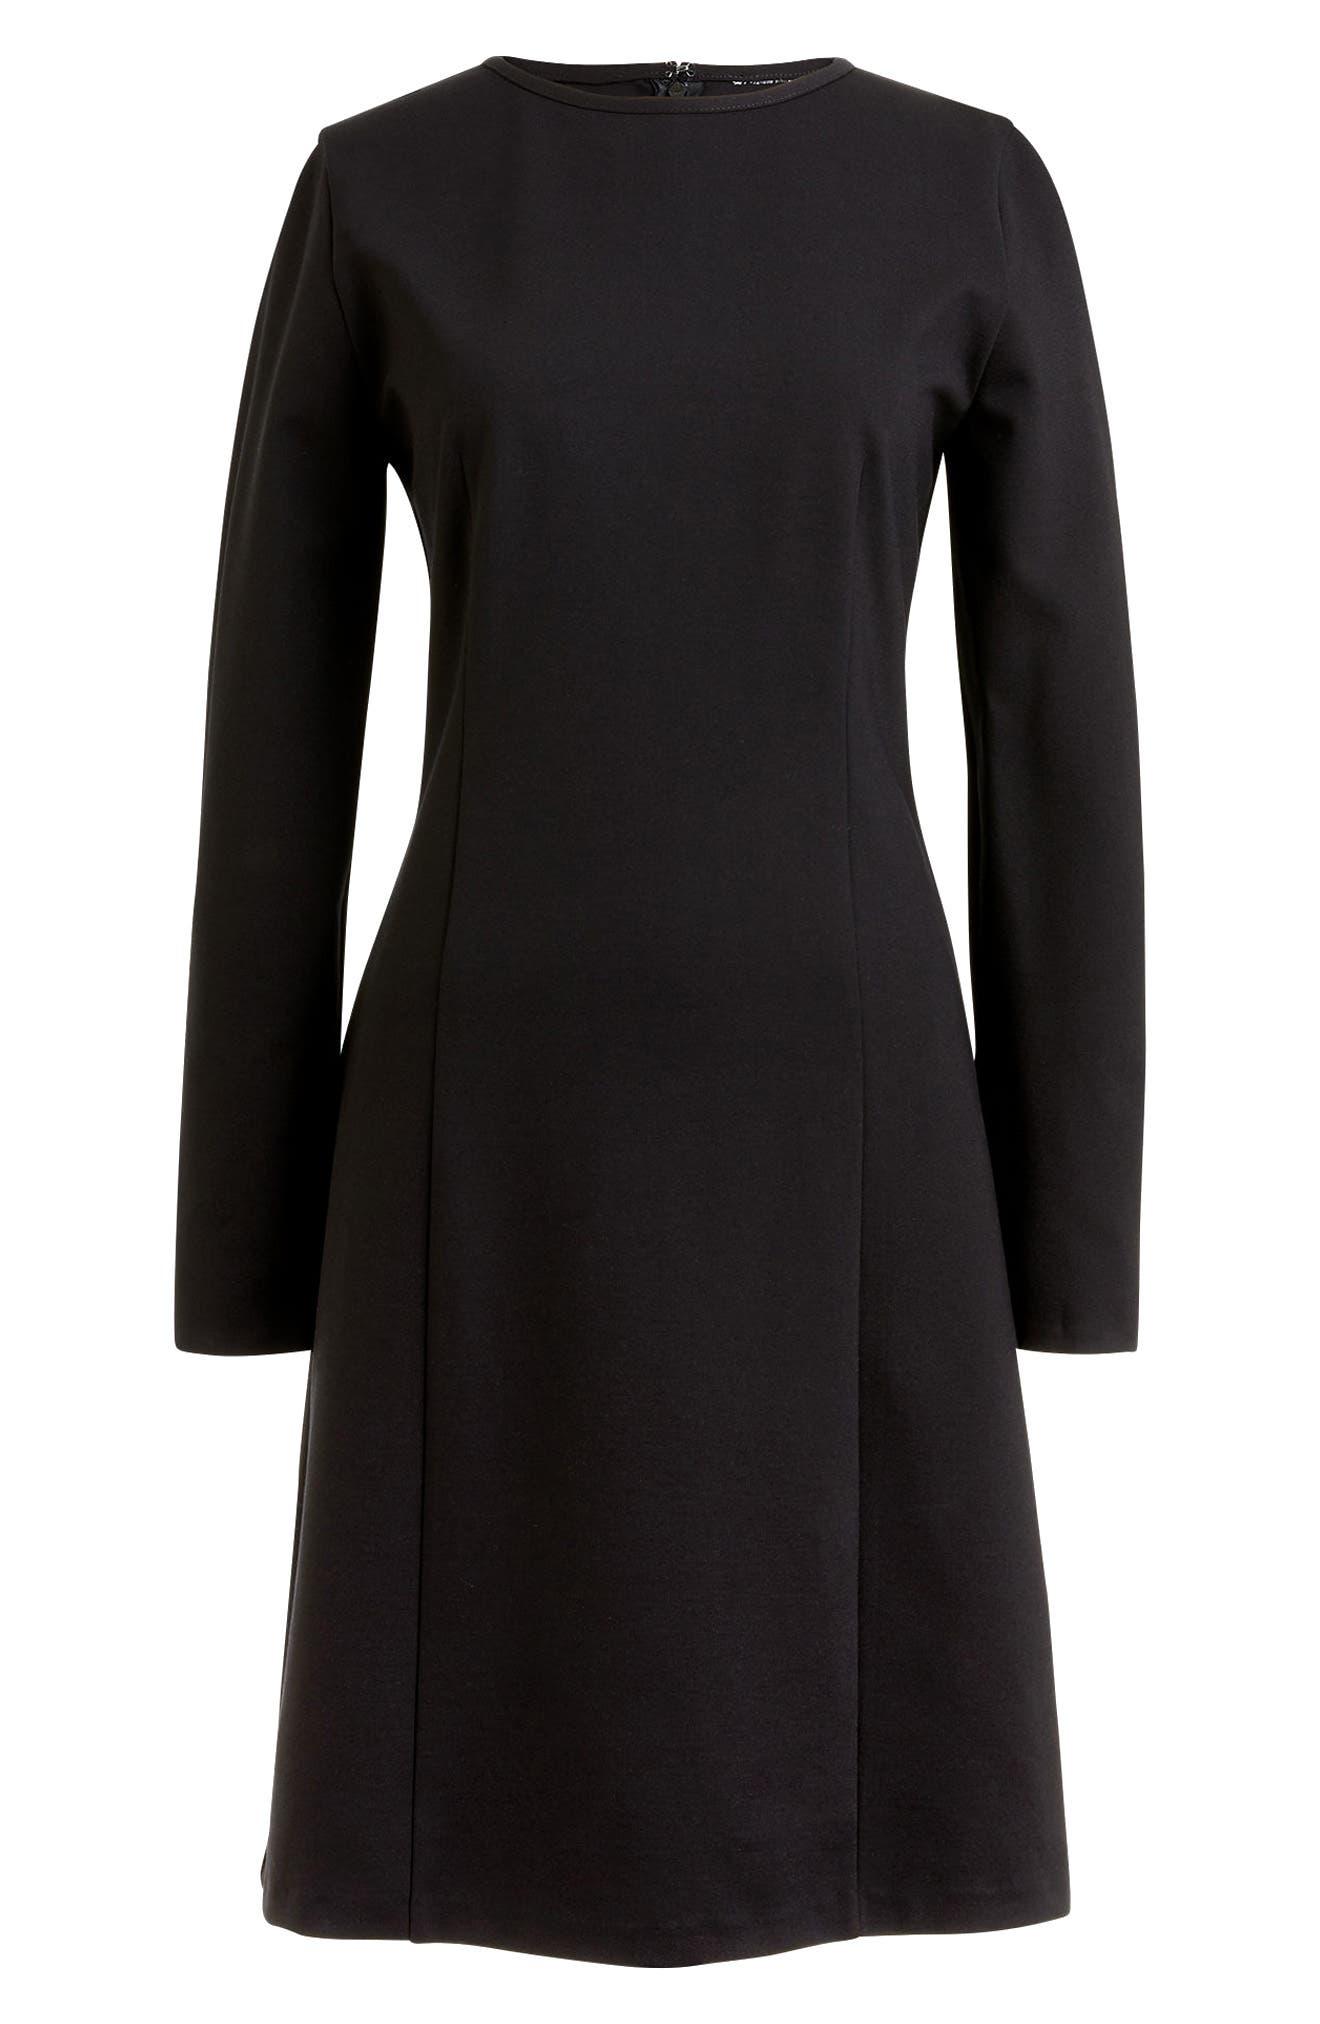 J.Crew Storm Ponte Knit Dress,                             Main thumbnail 1, color,                             Black